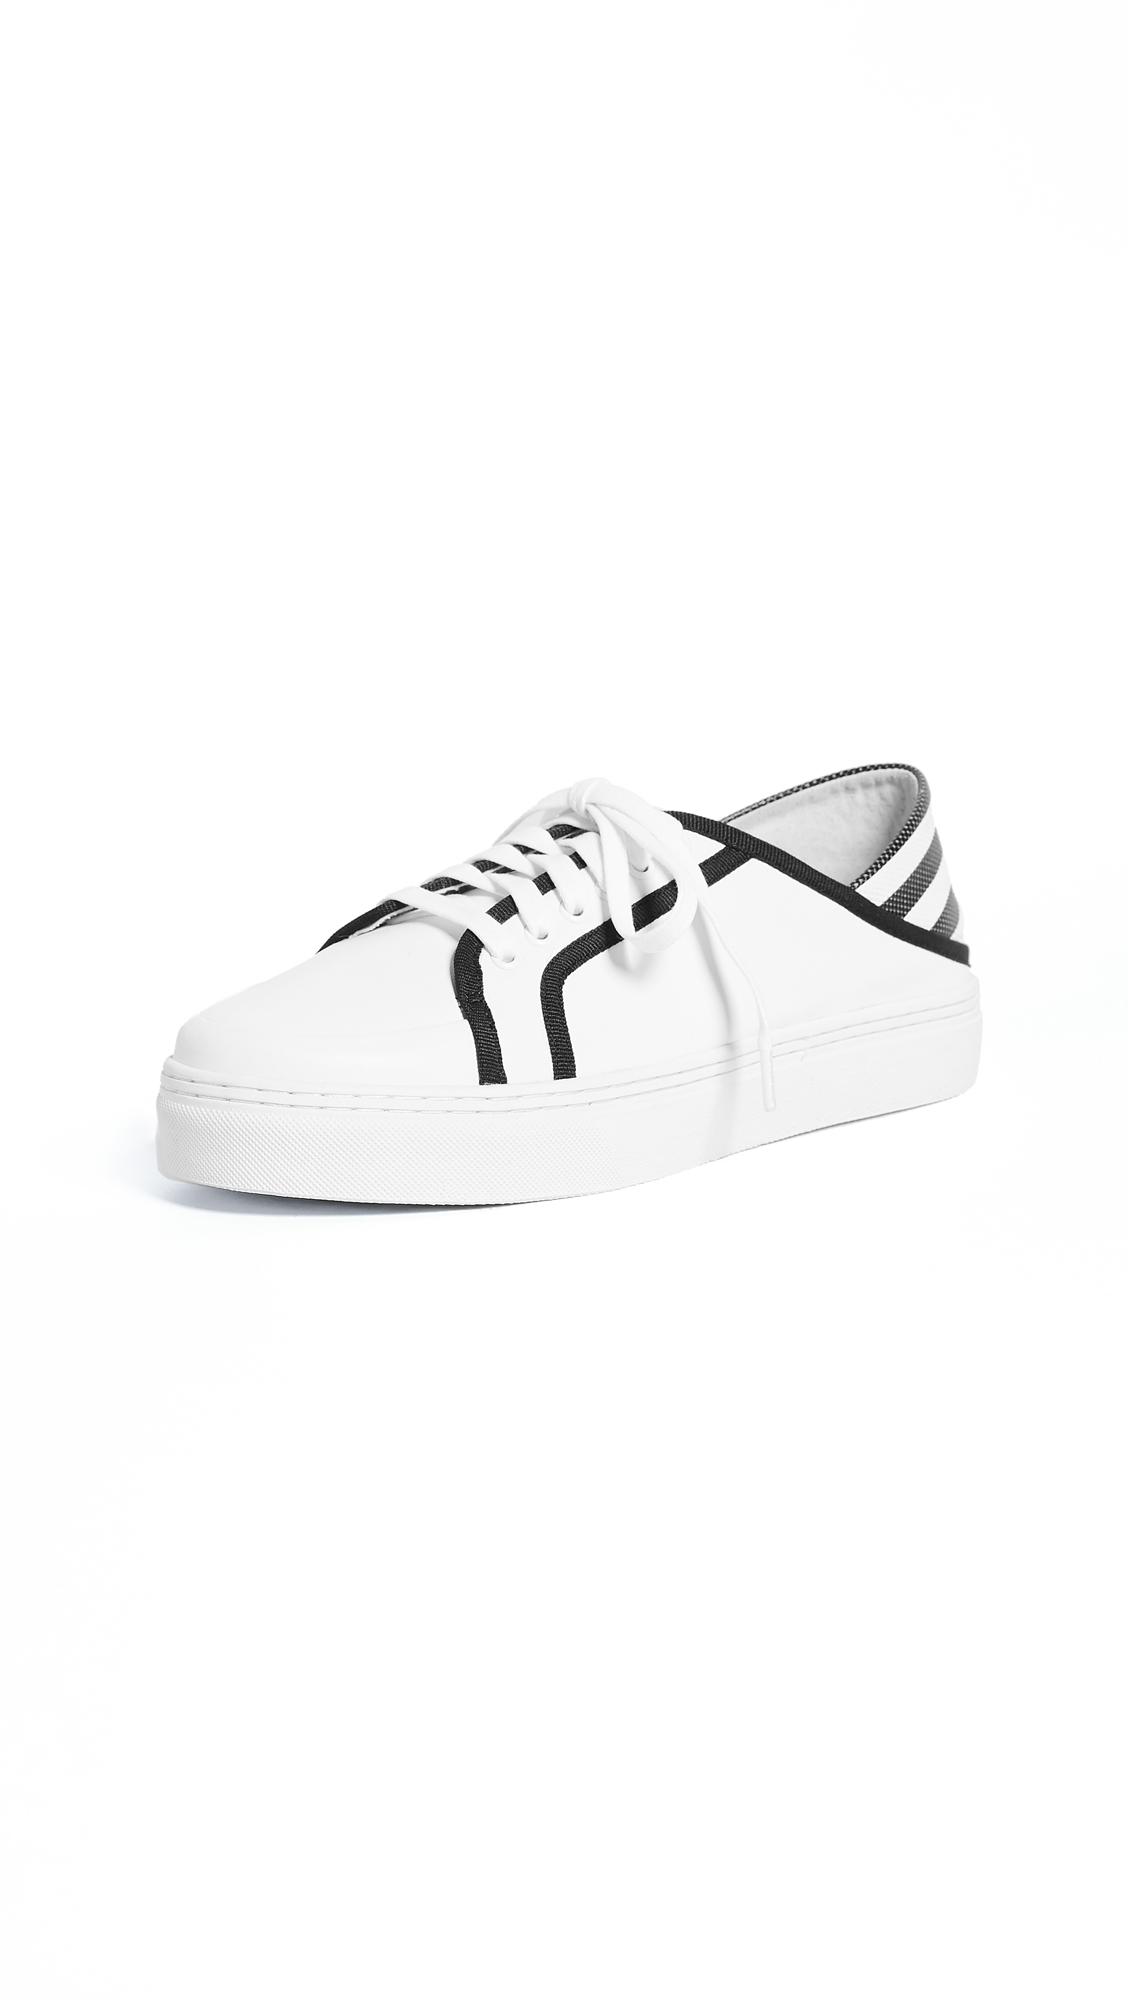 SENSO Avery II Sneakers - Ebony/White